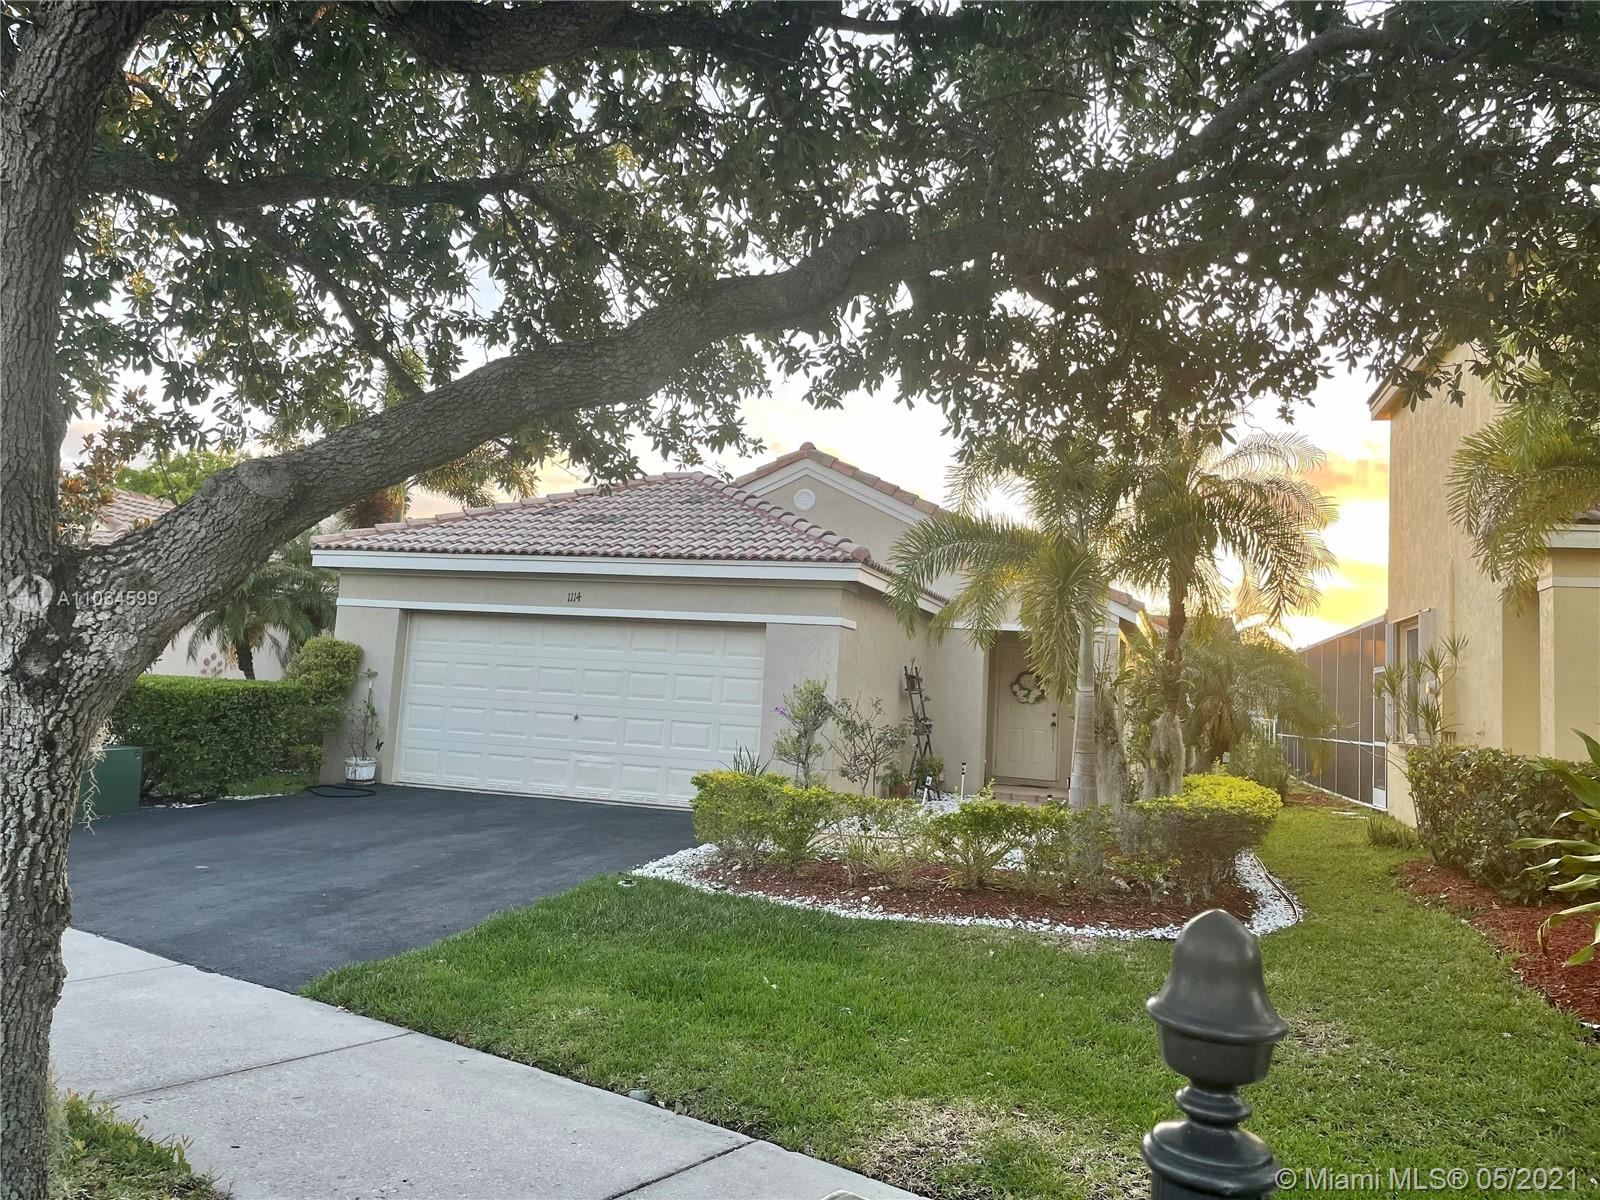 Photo of 1114 Alexander Bnd, Weston, FL 33327 (MLS # A11034599)